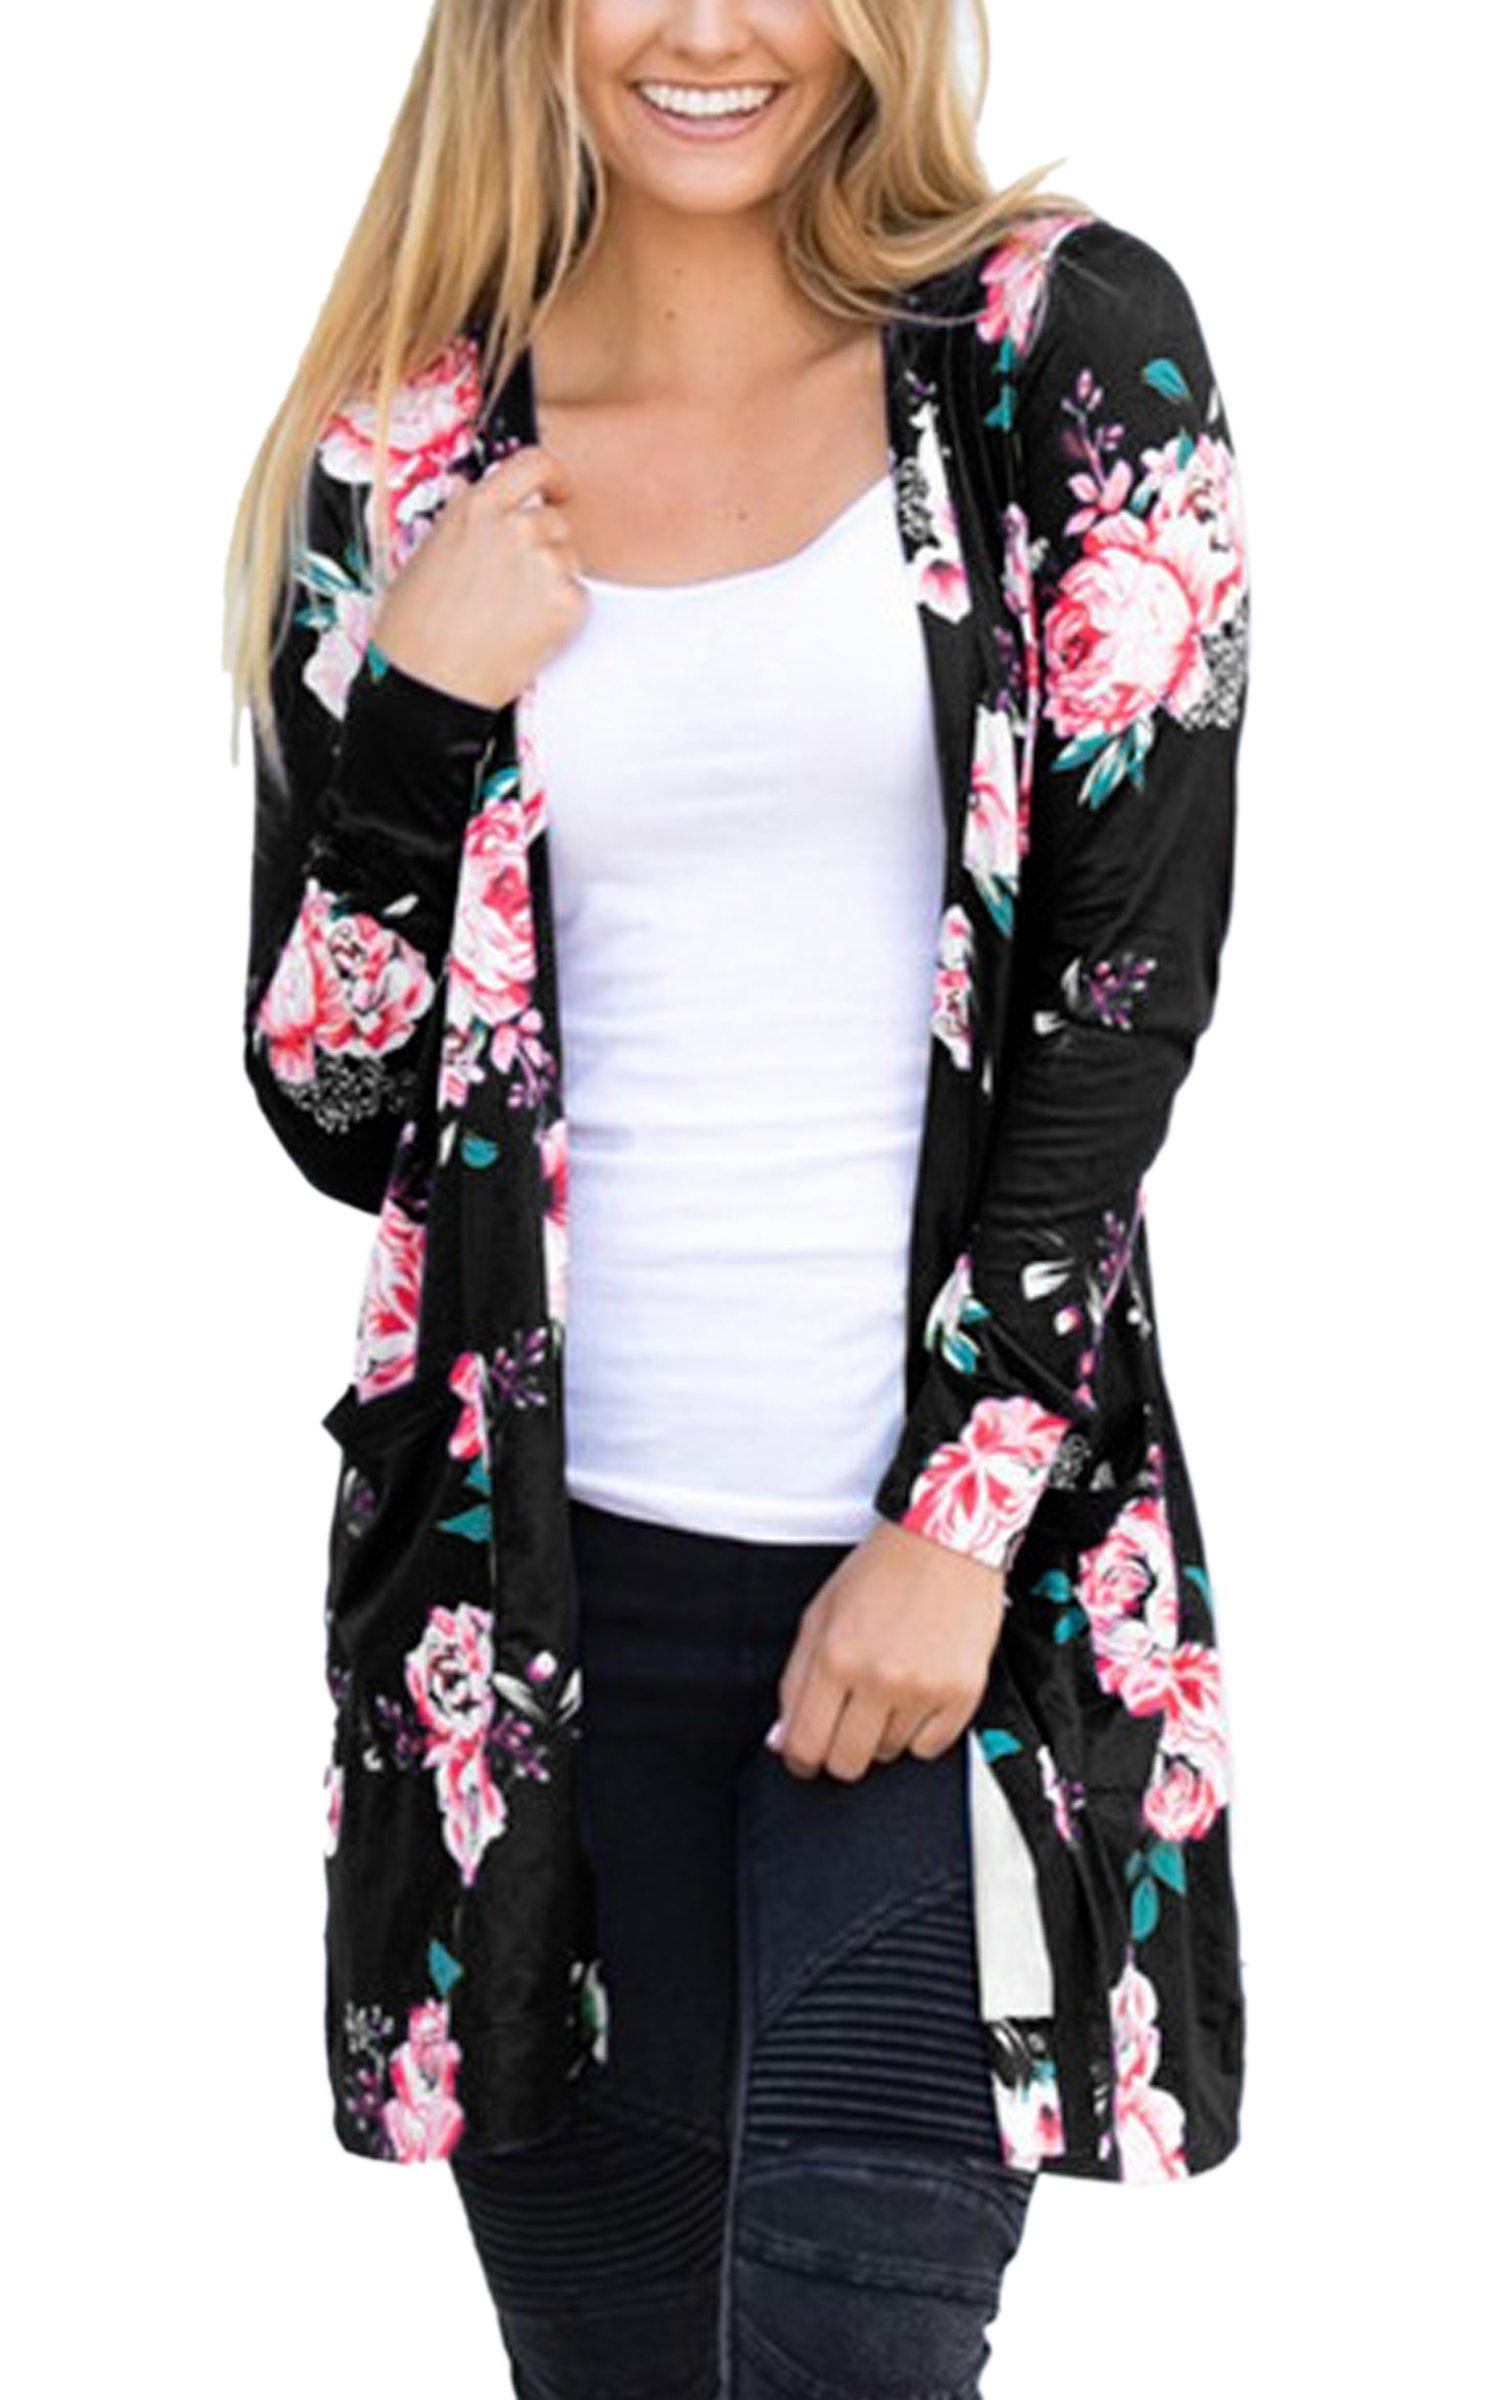 ECOWISH Womens Floral Print Long Sleeves Kimono Cardigans Blouses Coverup Chiffon Jacket Tops, Black2, Small